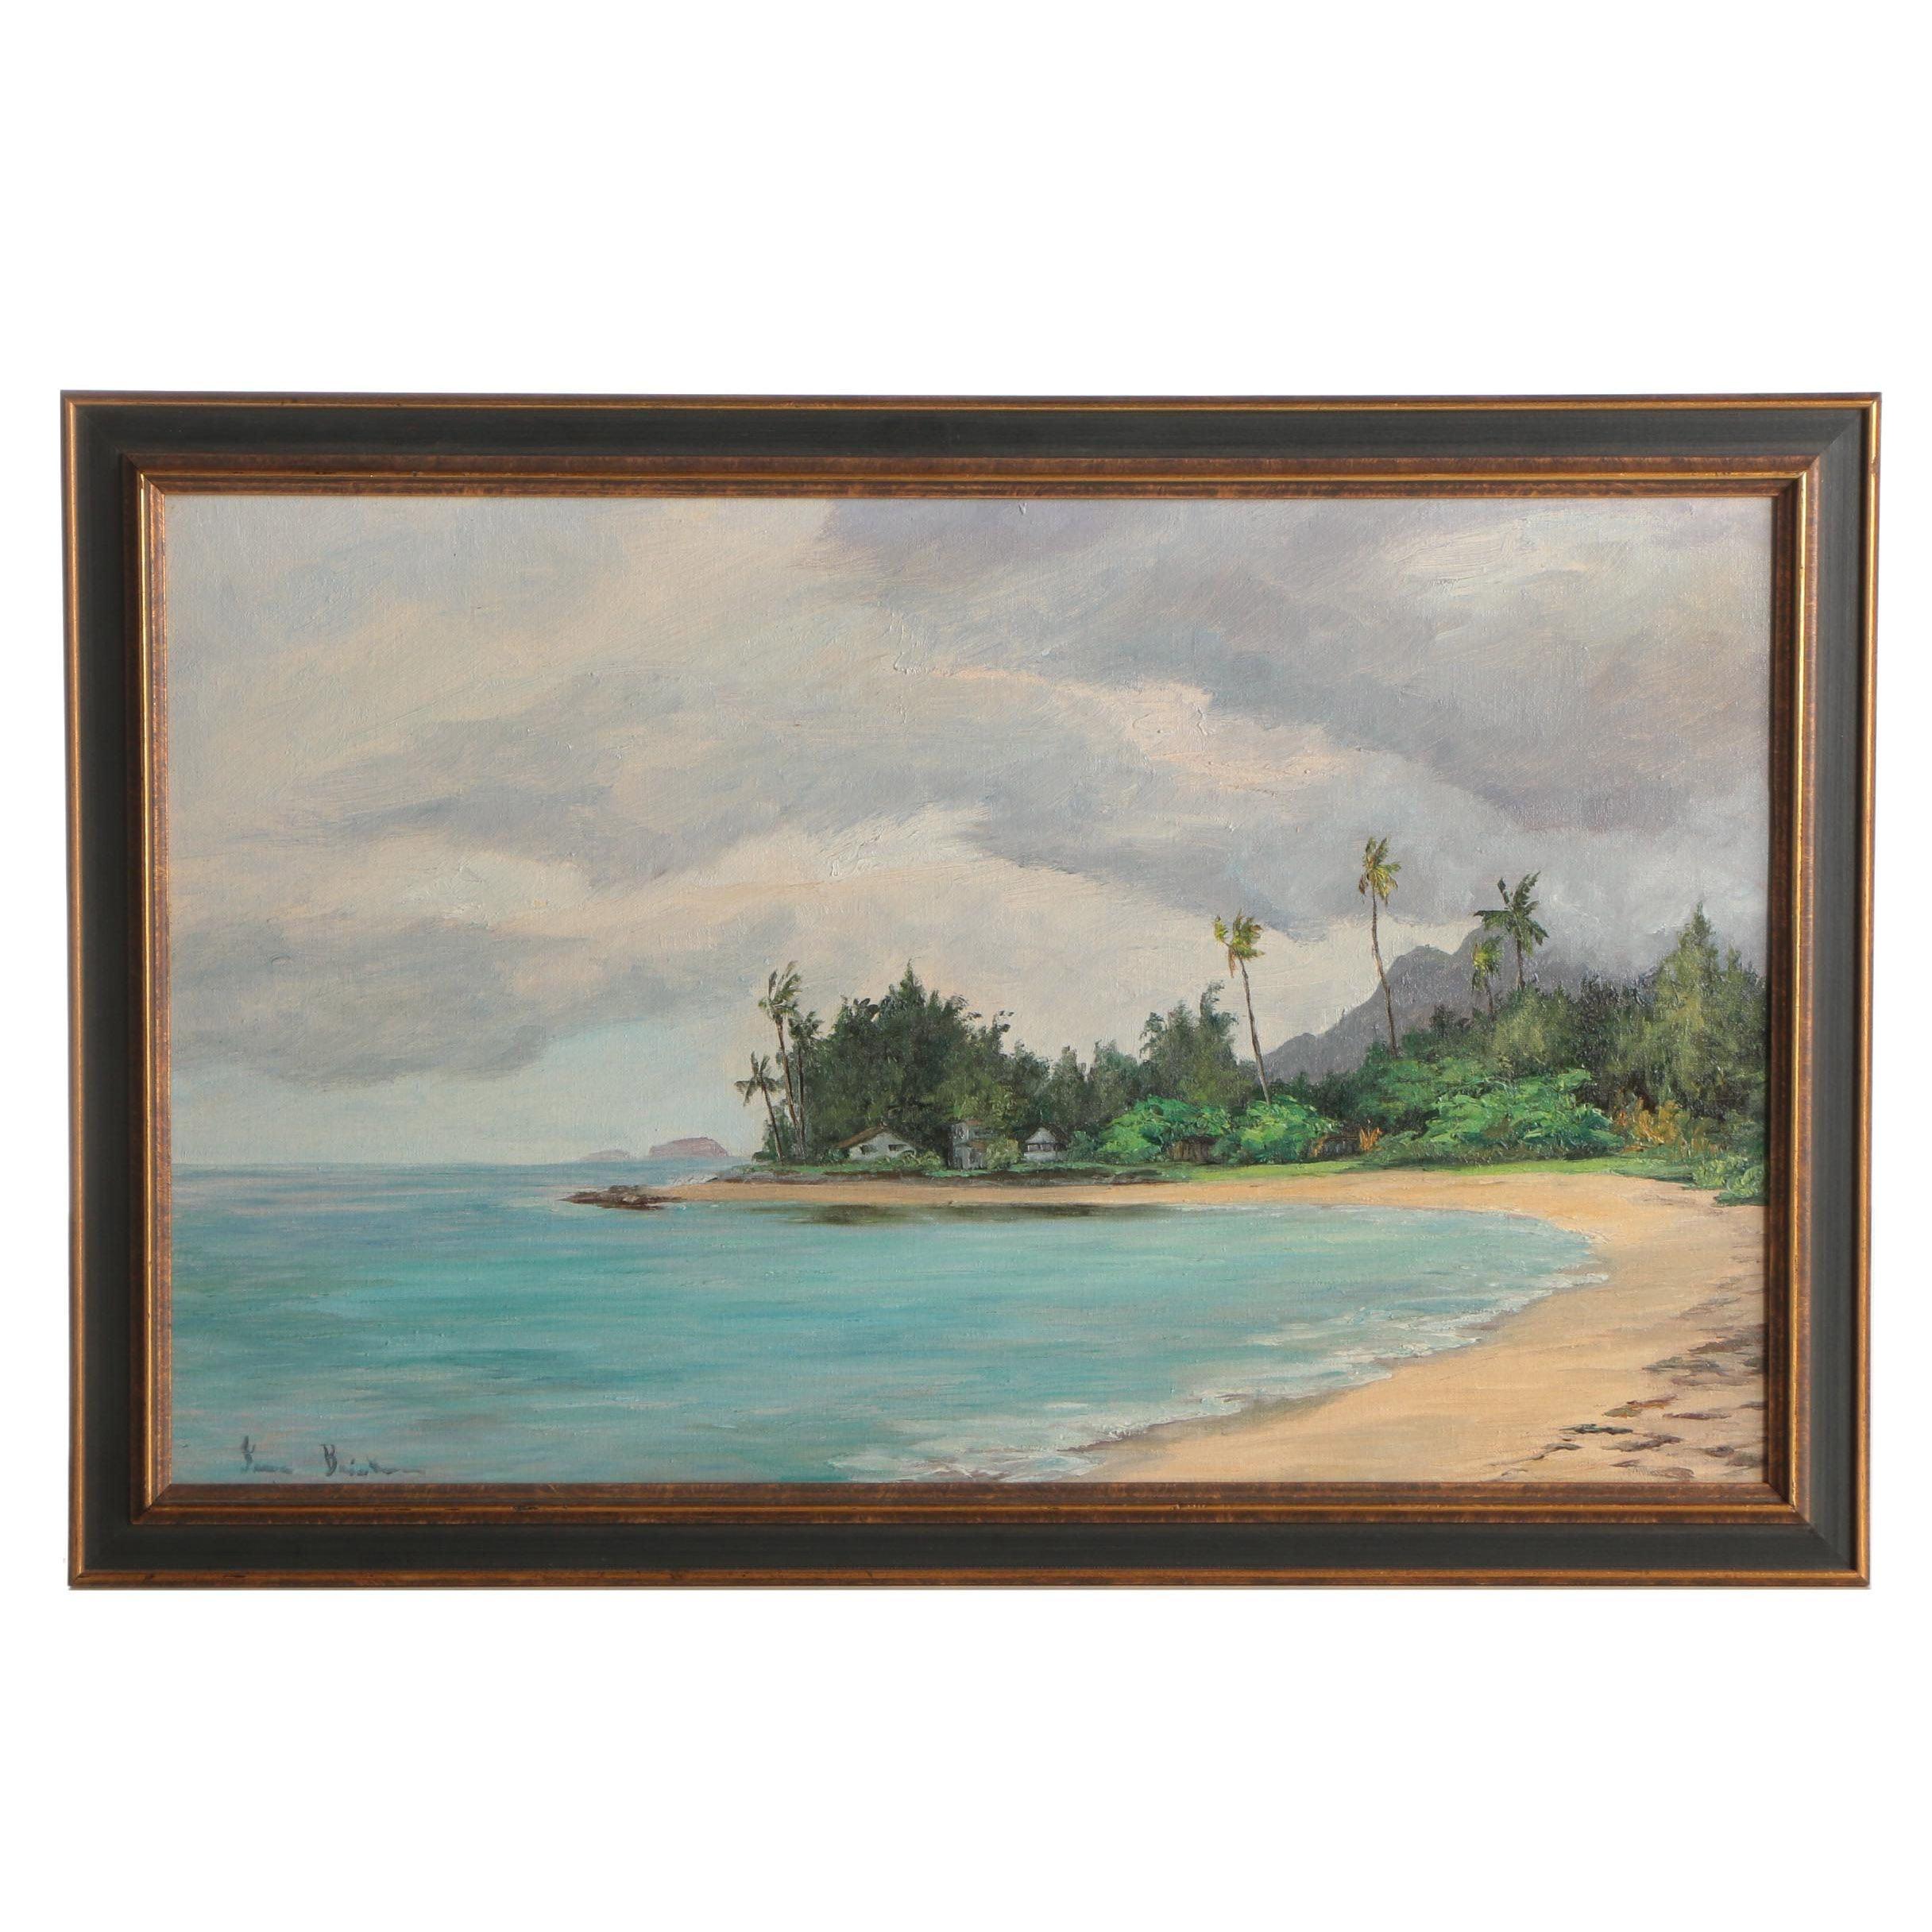 Irma Brickman Landscape Oil Painting